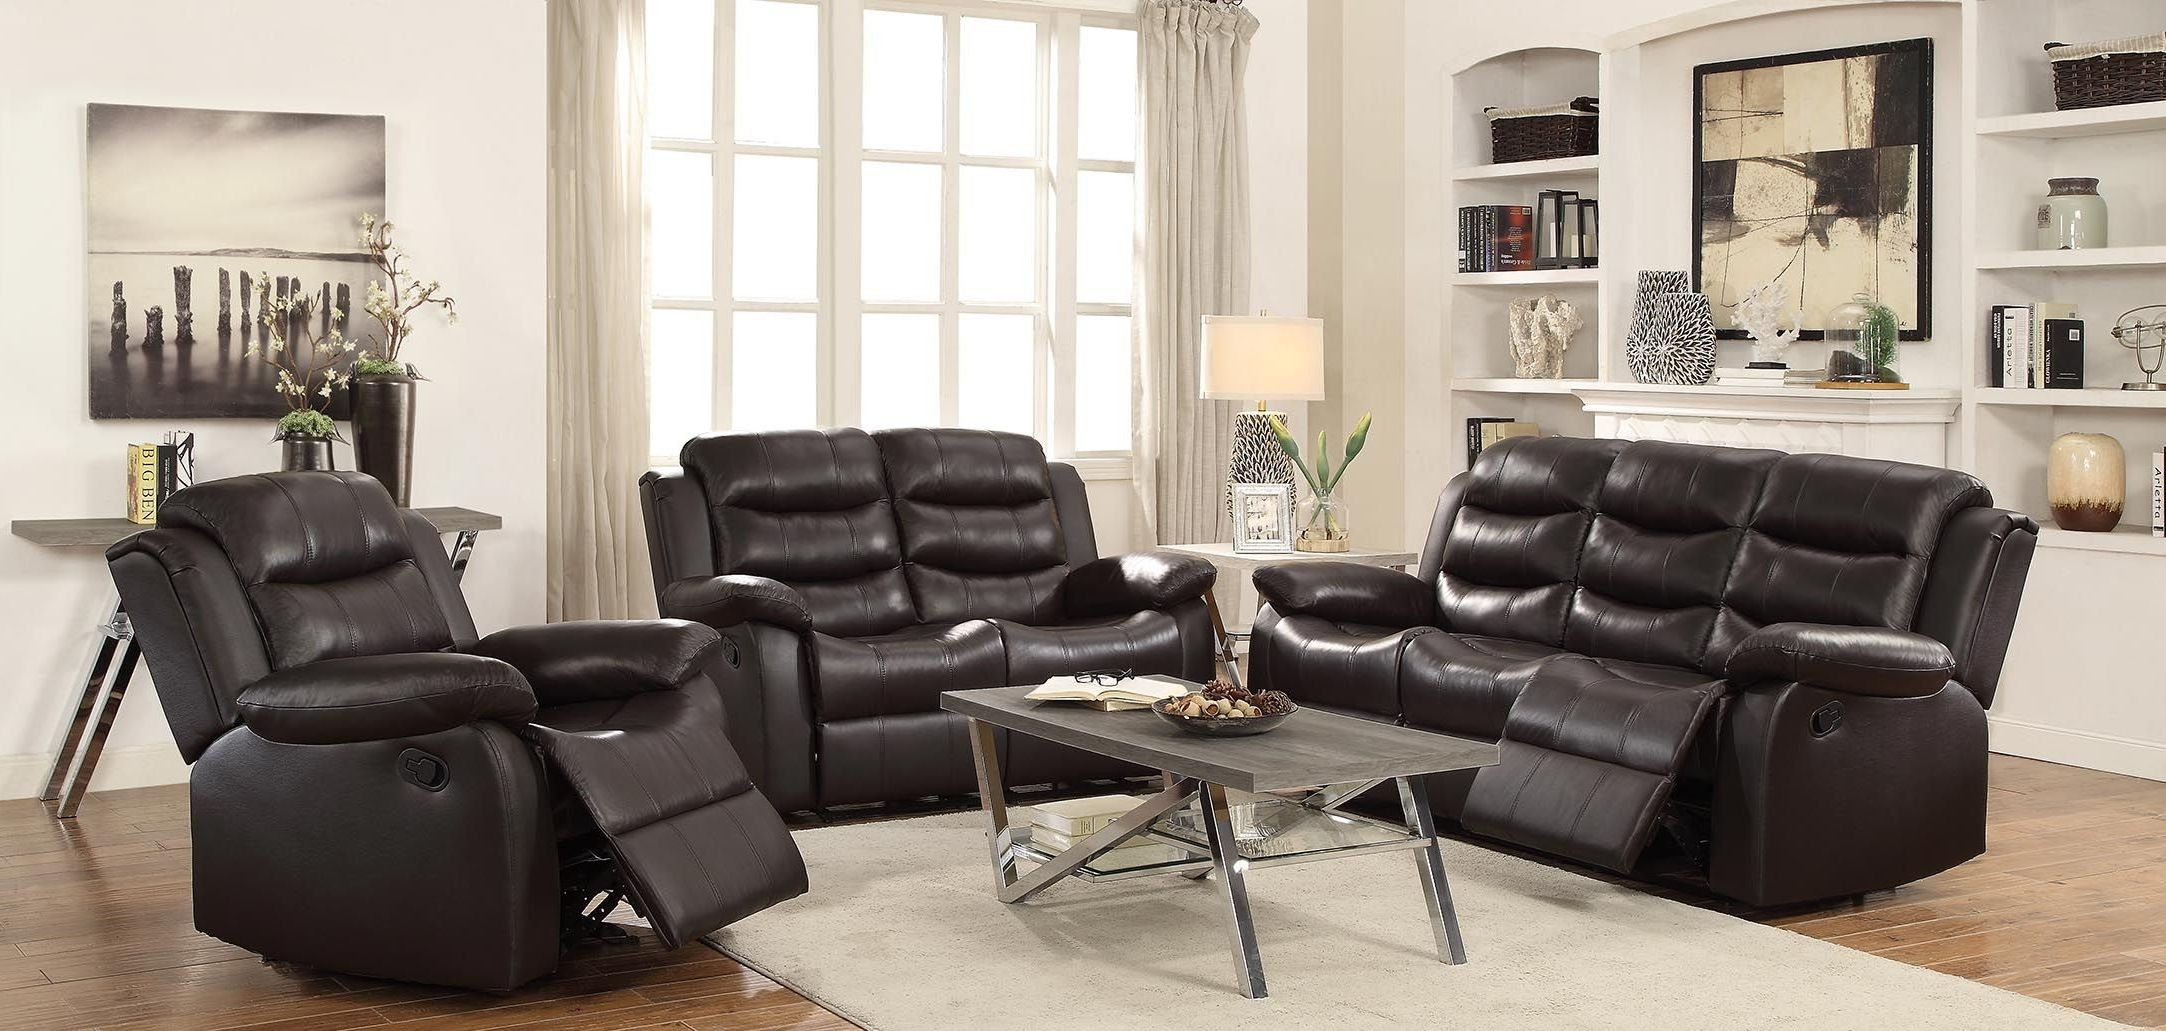 Rodman Motion Dark Brown Reclining Living Room Set 602221 Coaster Furniture